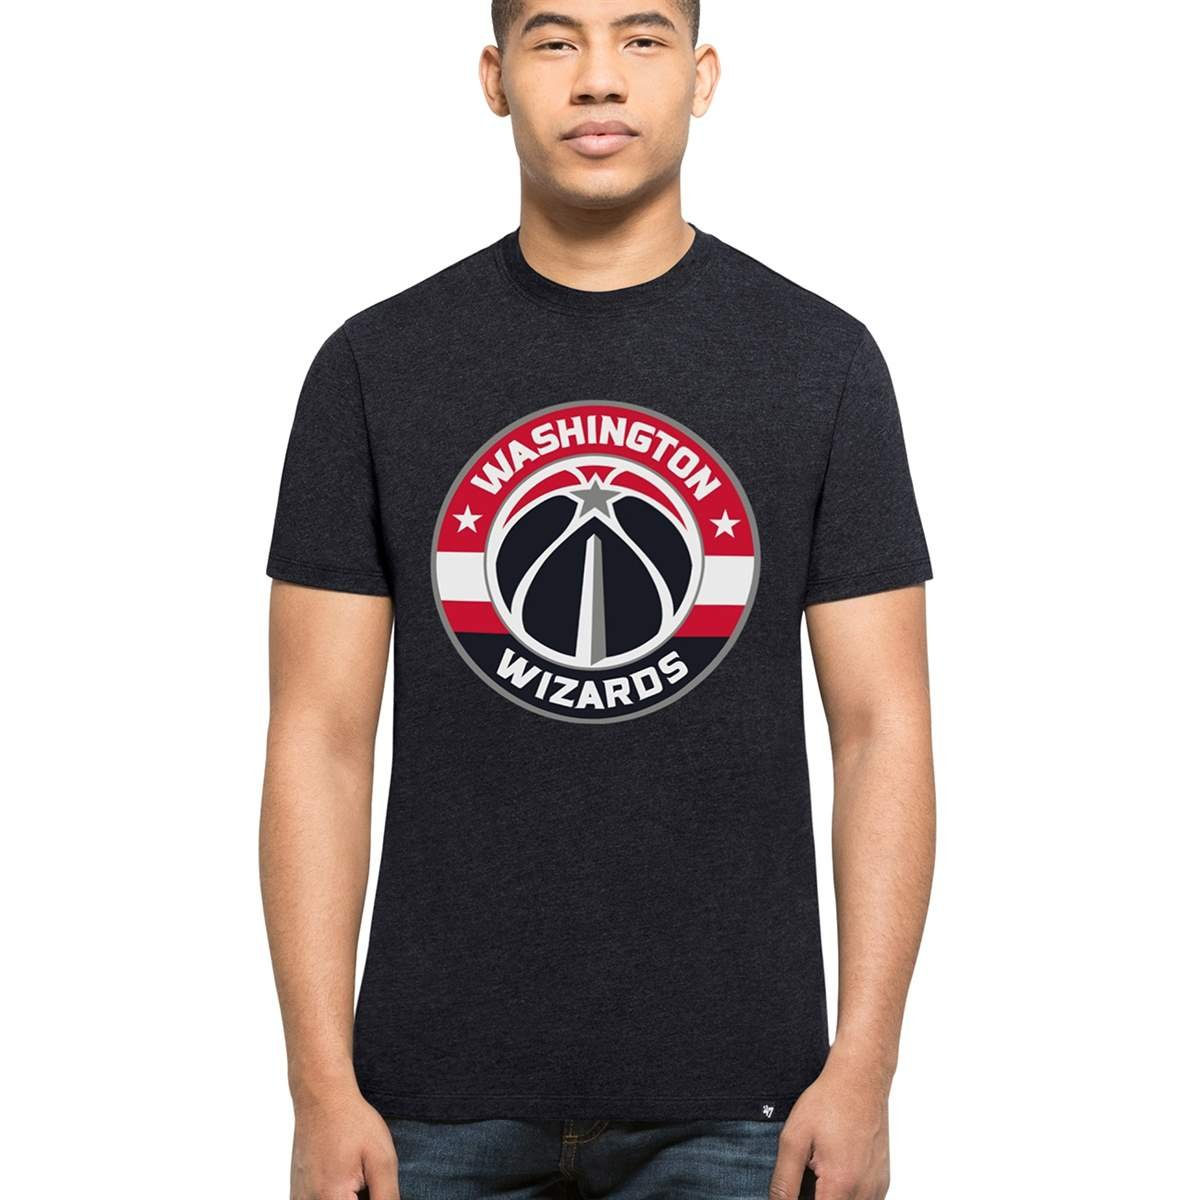 '47 Brand Washington Wizards Club NBA T-Shirt Navy '47 Brand